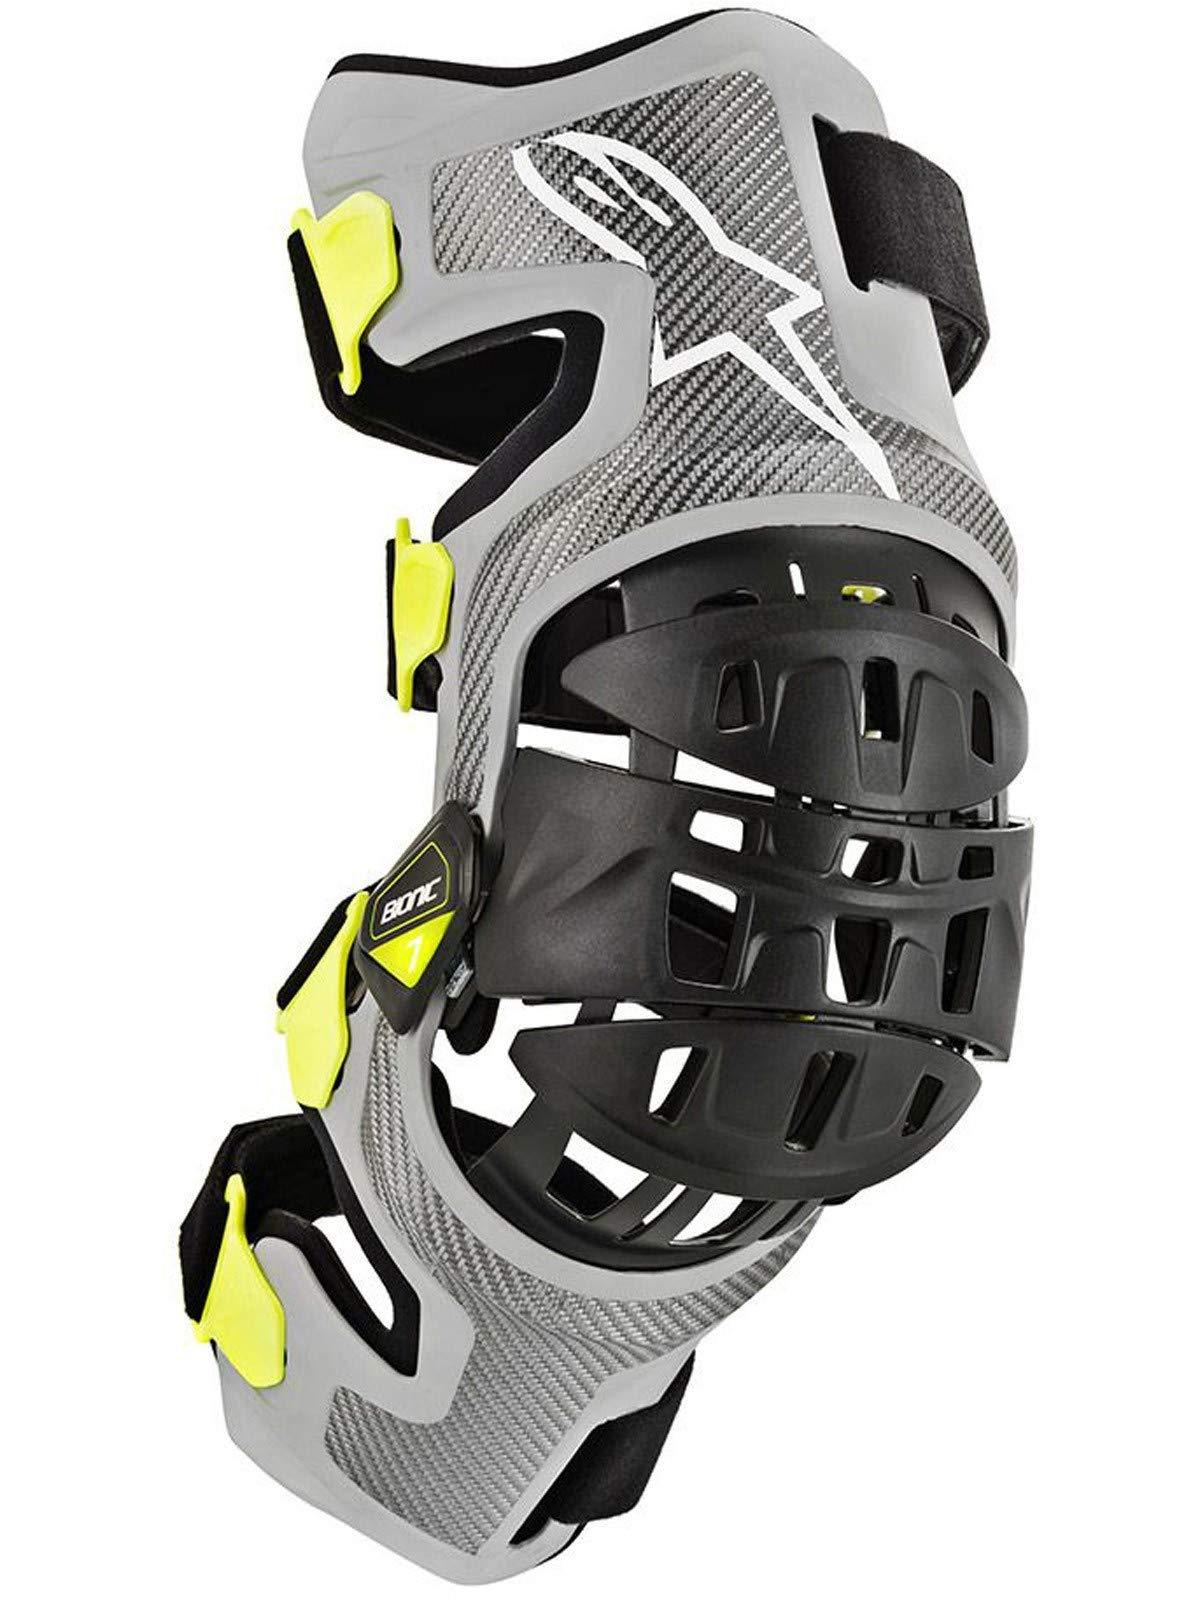 Bionic-7 Off-Road Motocross Knee Brace Set (Medium, Silver Yellow Fluo) by Alpinestars (Image #4)